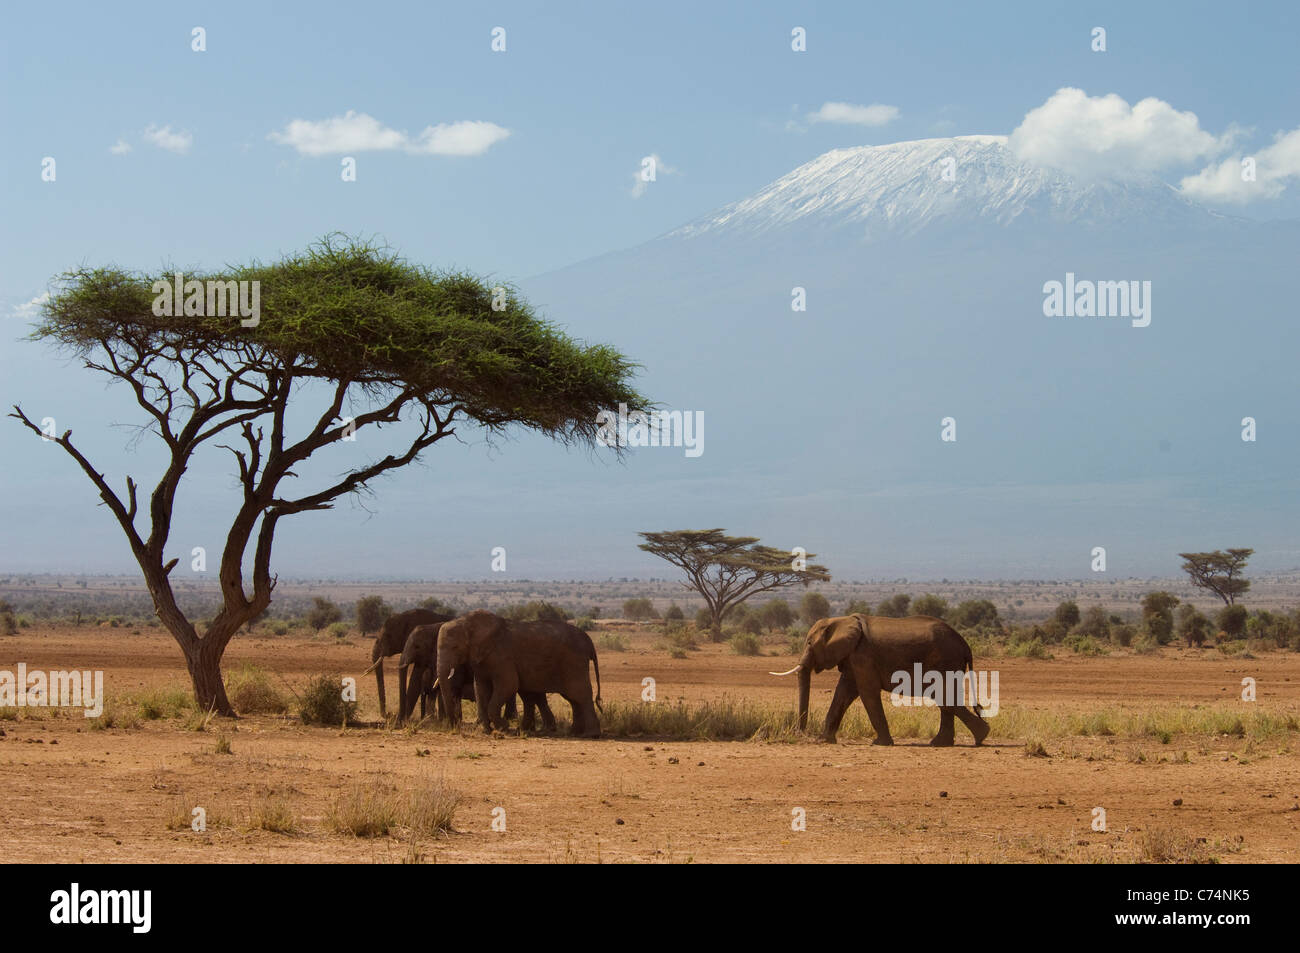 Africa, Kenya, Amboseli-Elephants walking in plains with Mt. Kilimanjaro in background - Stock Image